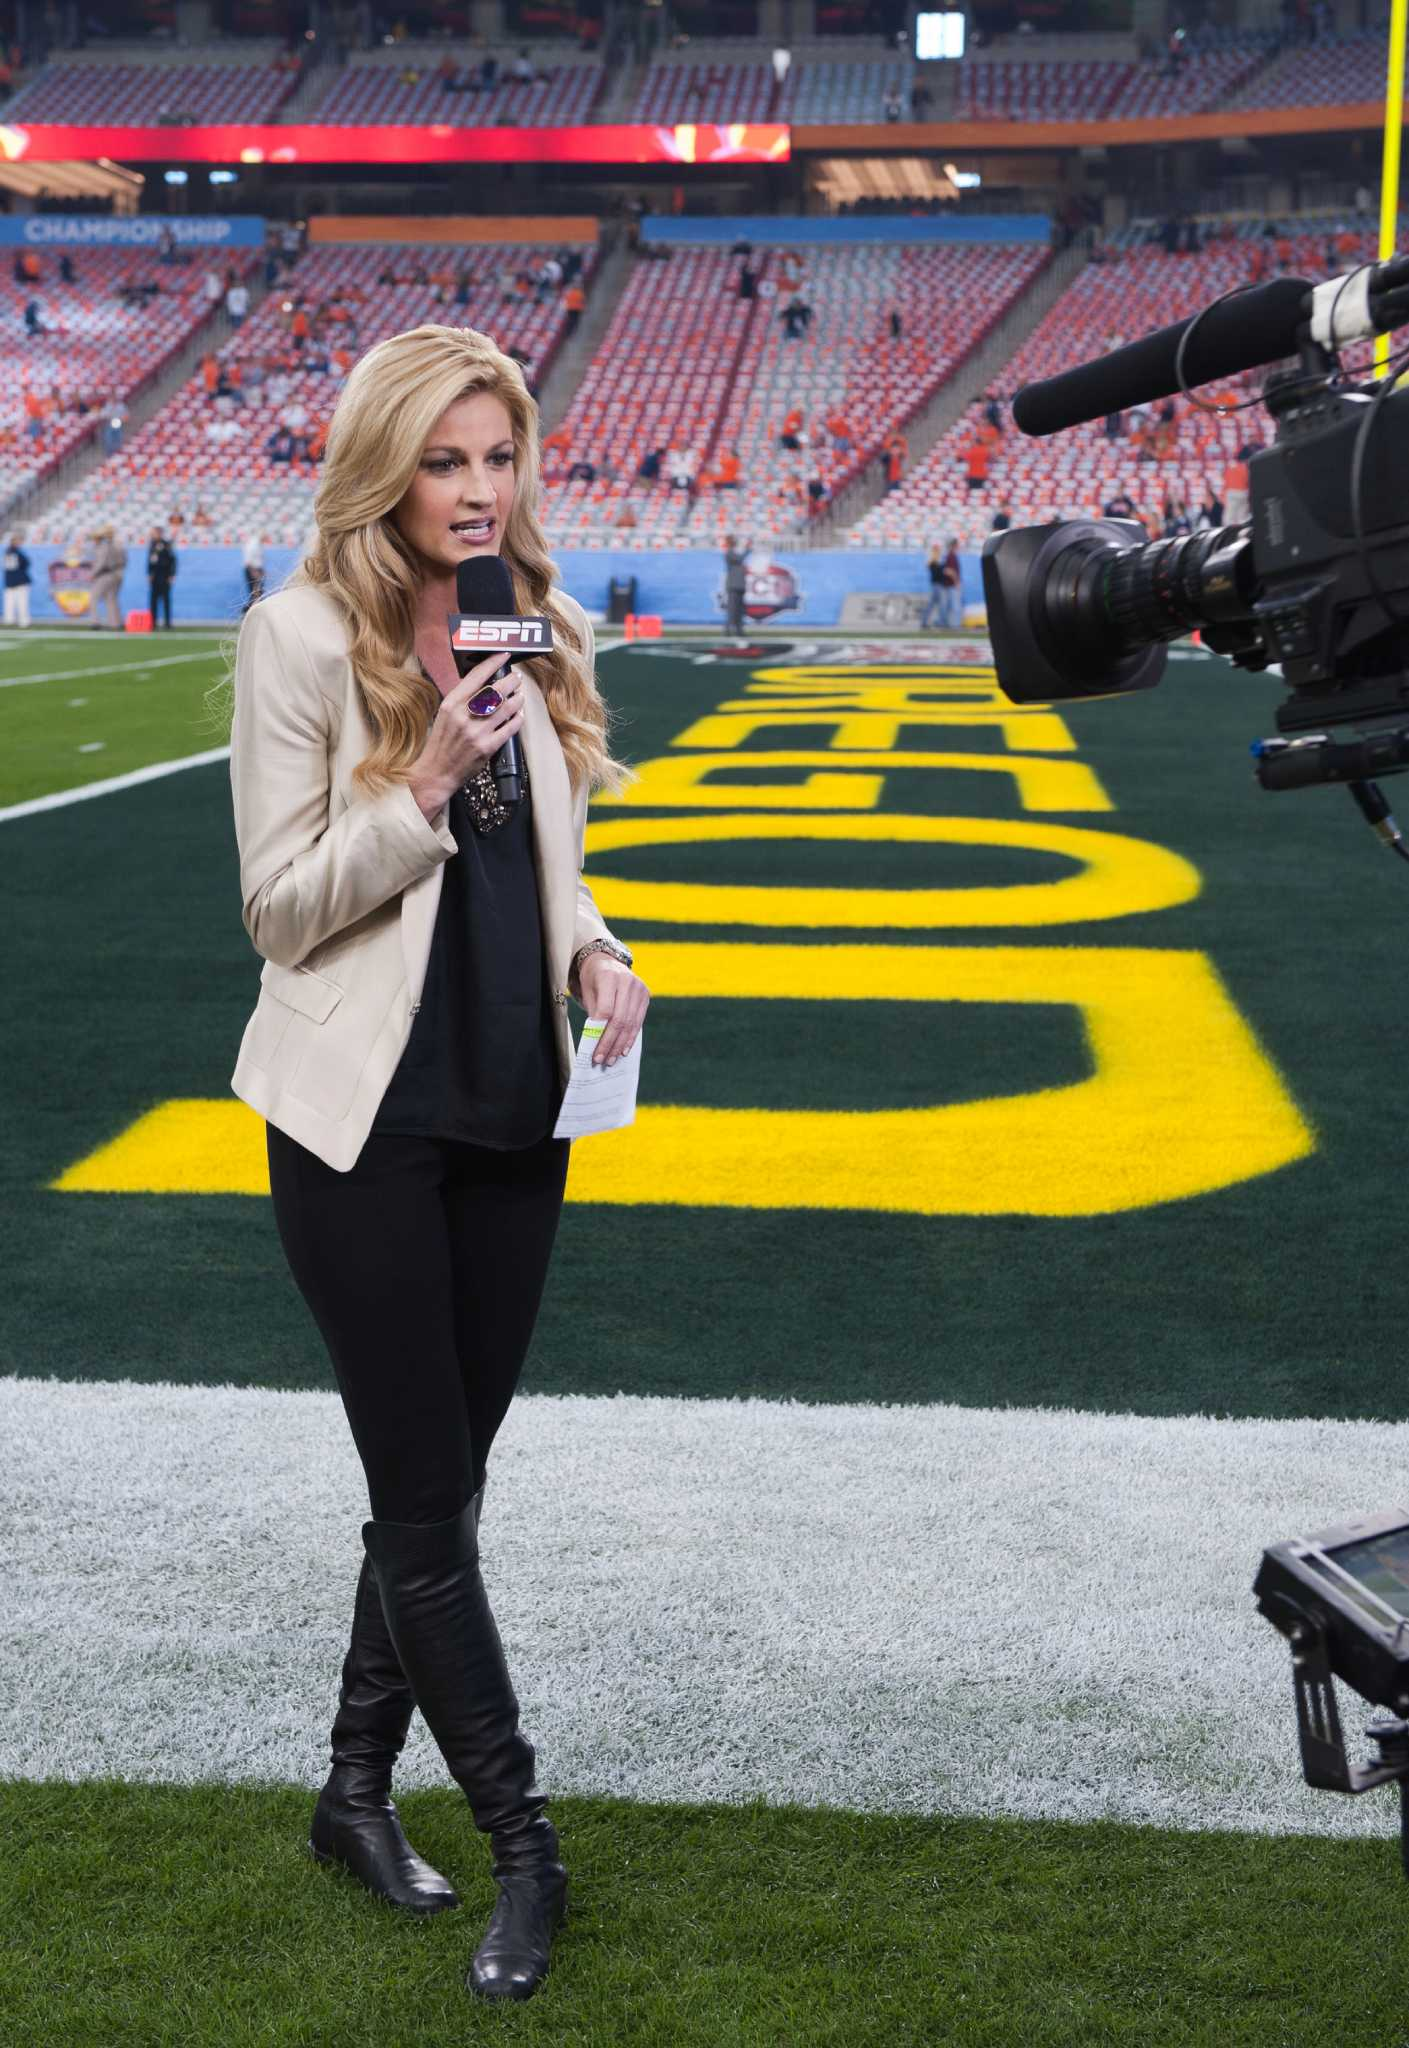 erin andrews espn bcs broadcast sportscasters reporter female championship anchor stadium university phoenix sideline oregon sidelines picking cable bowl wear